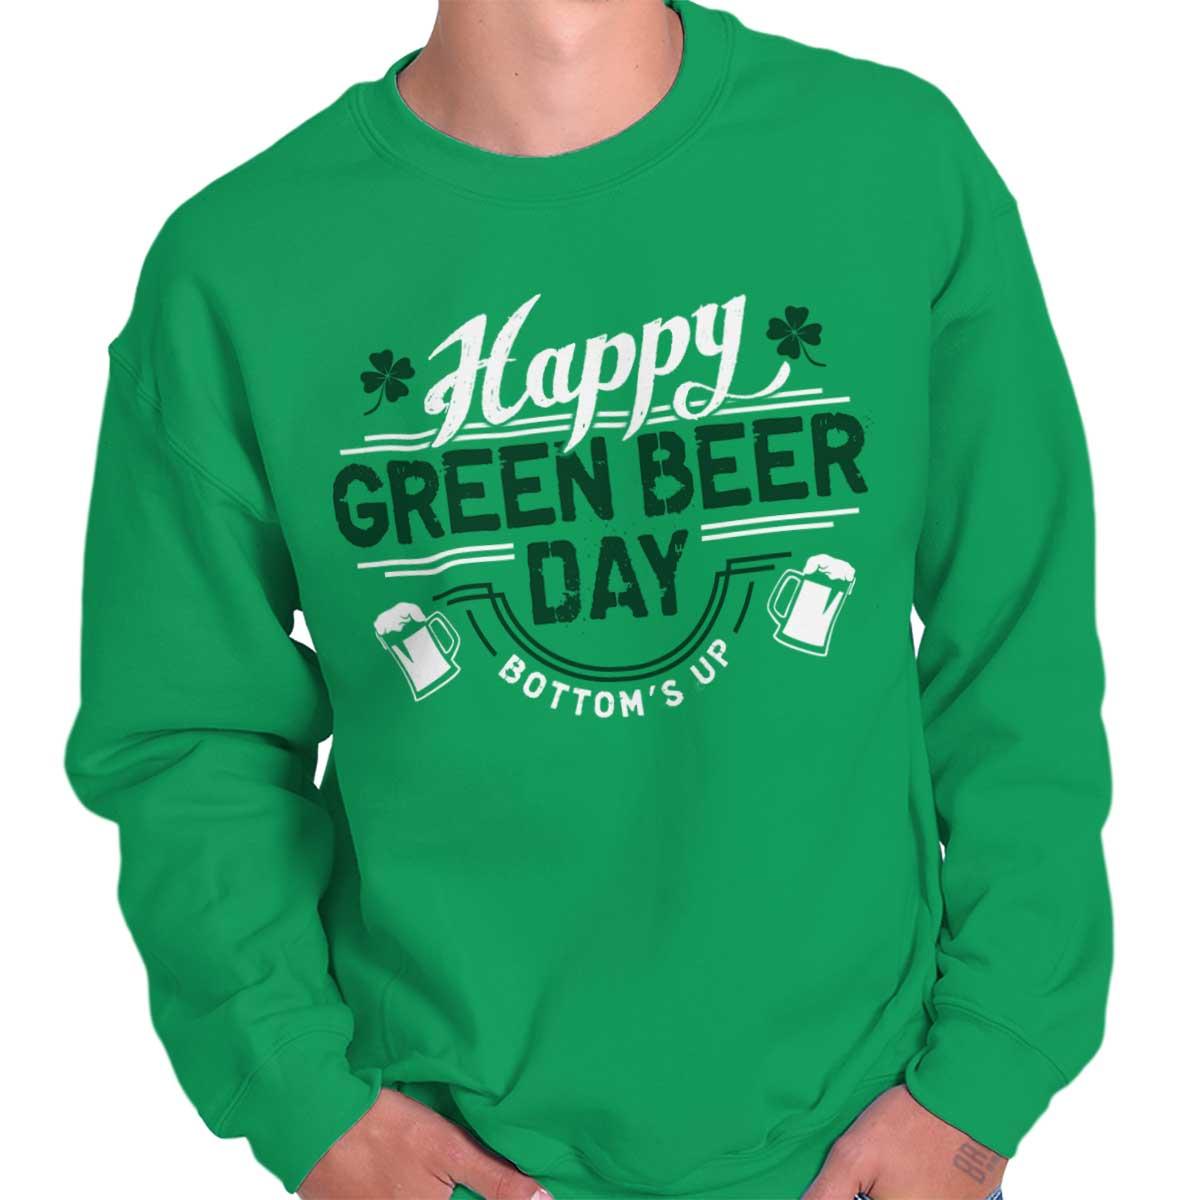 Patricks Day Beer Irish Drunk Funny Humor T Sweatshirt Green Beer Day St